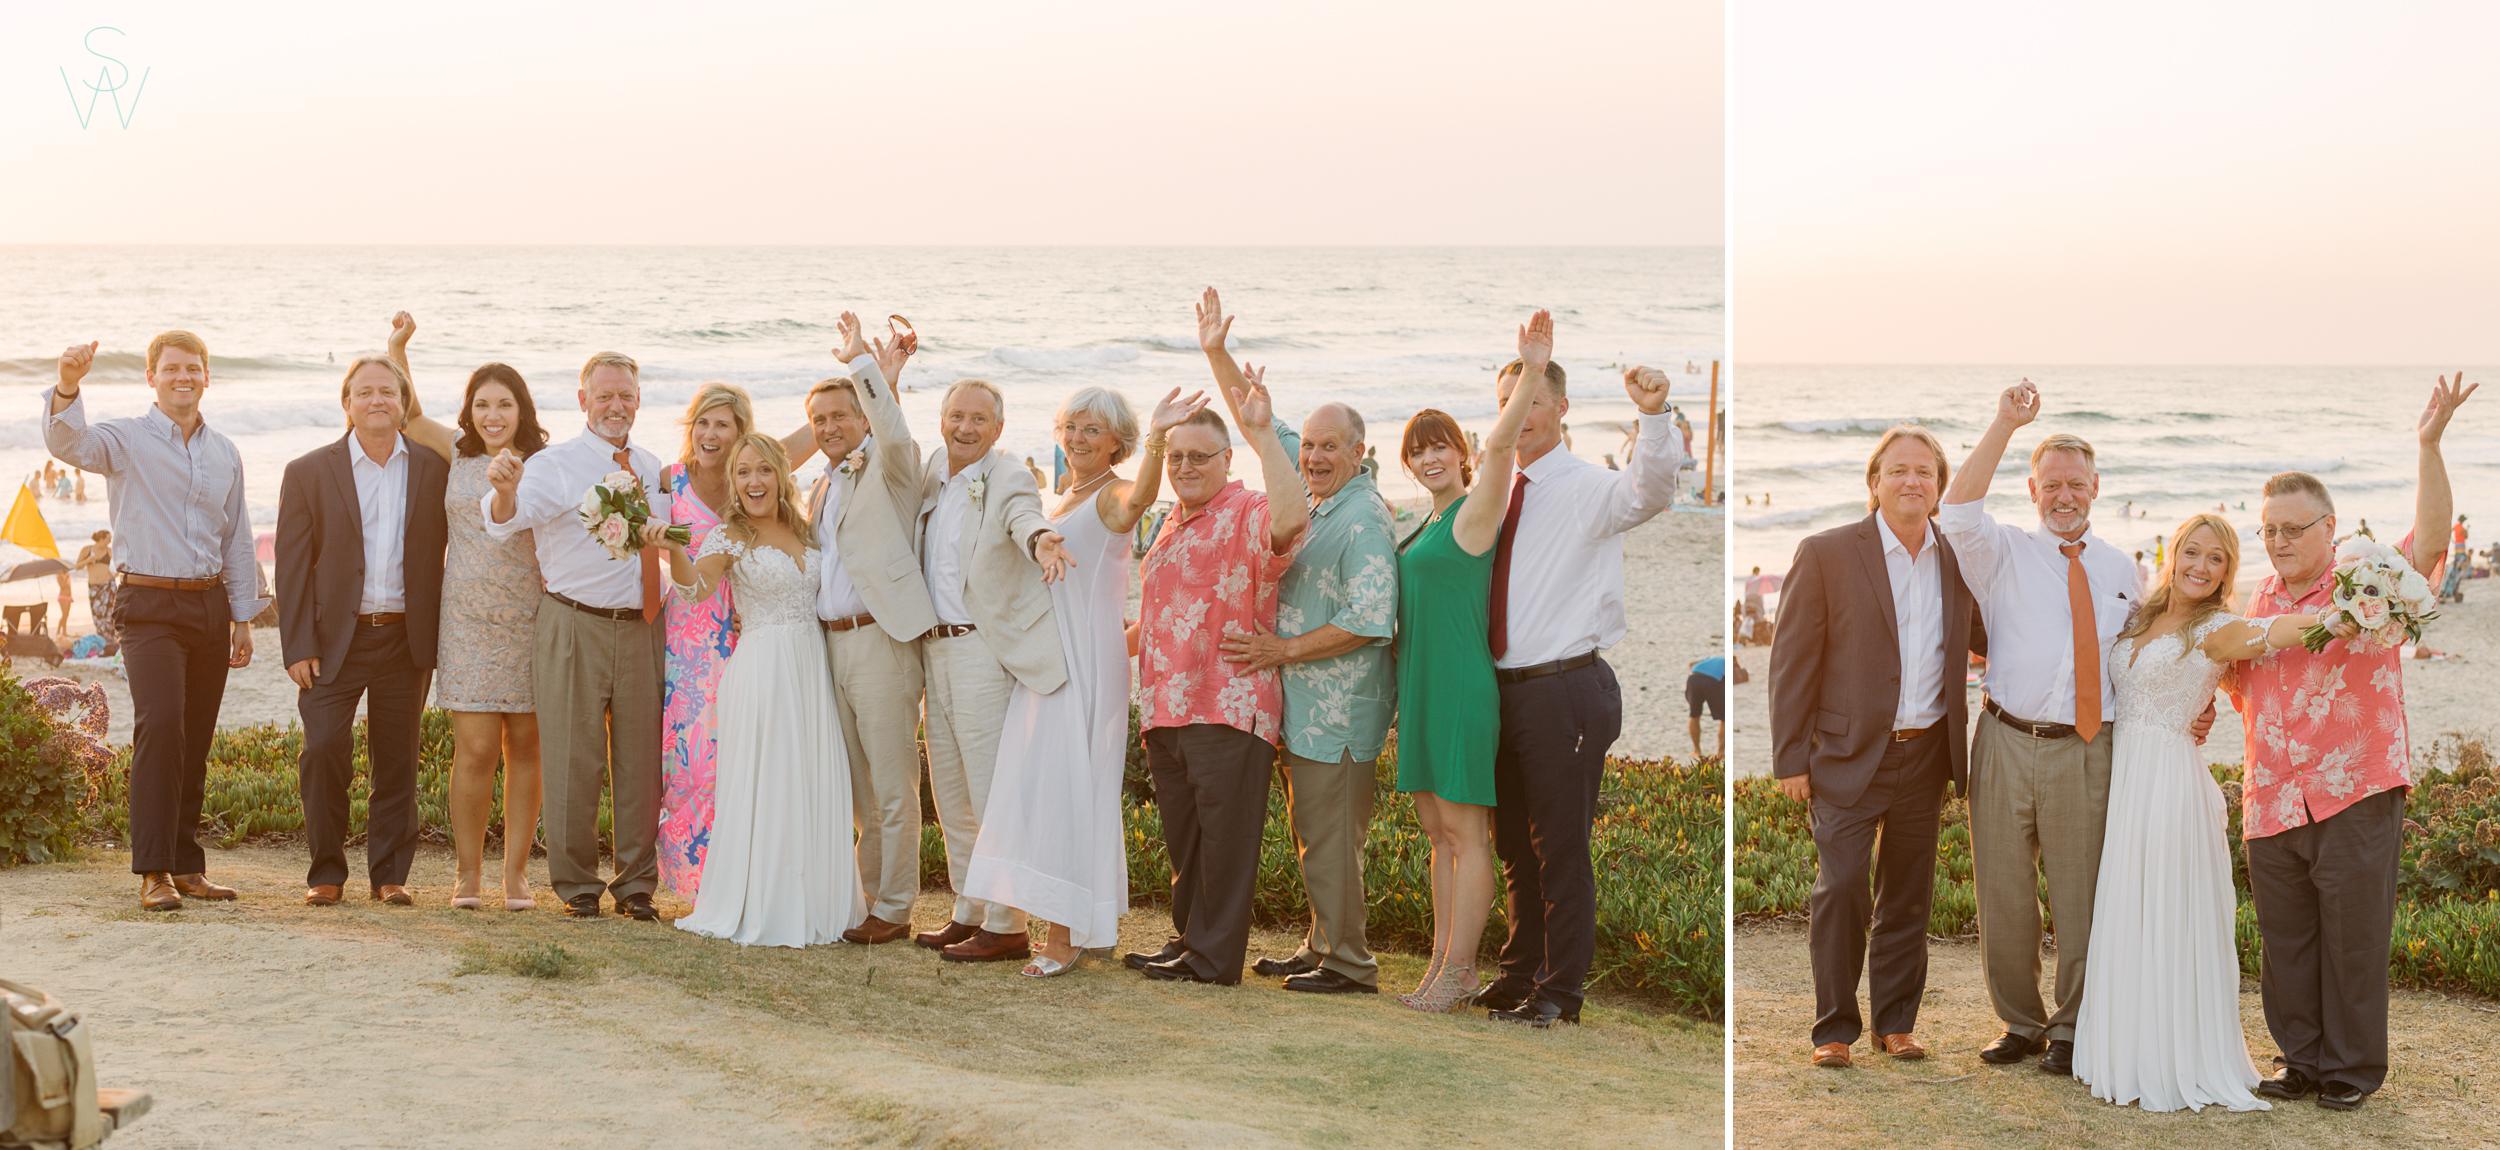 157DEL.MAR.WEDDINGS.weddingguest.photography.shewanders.JPG